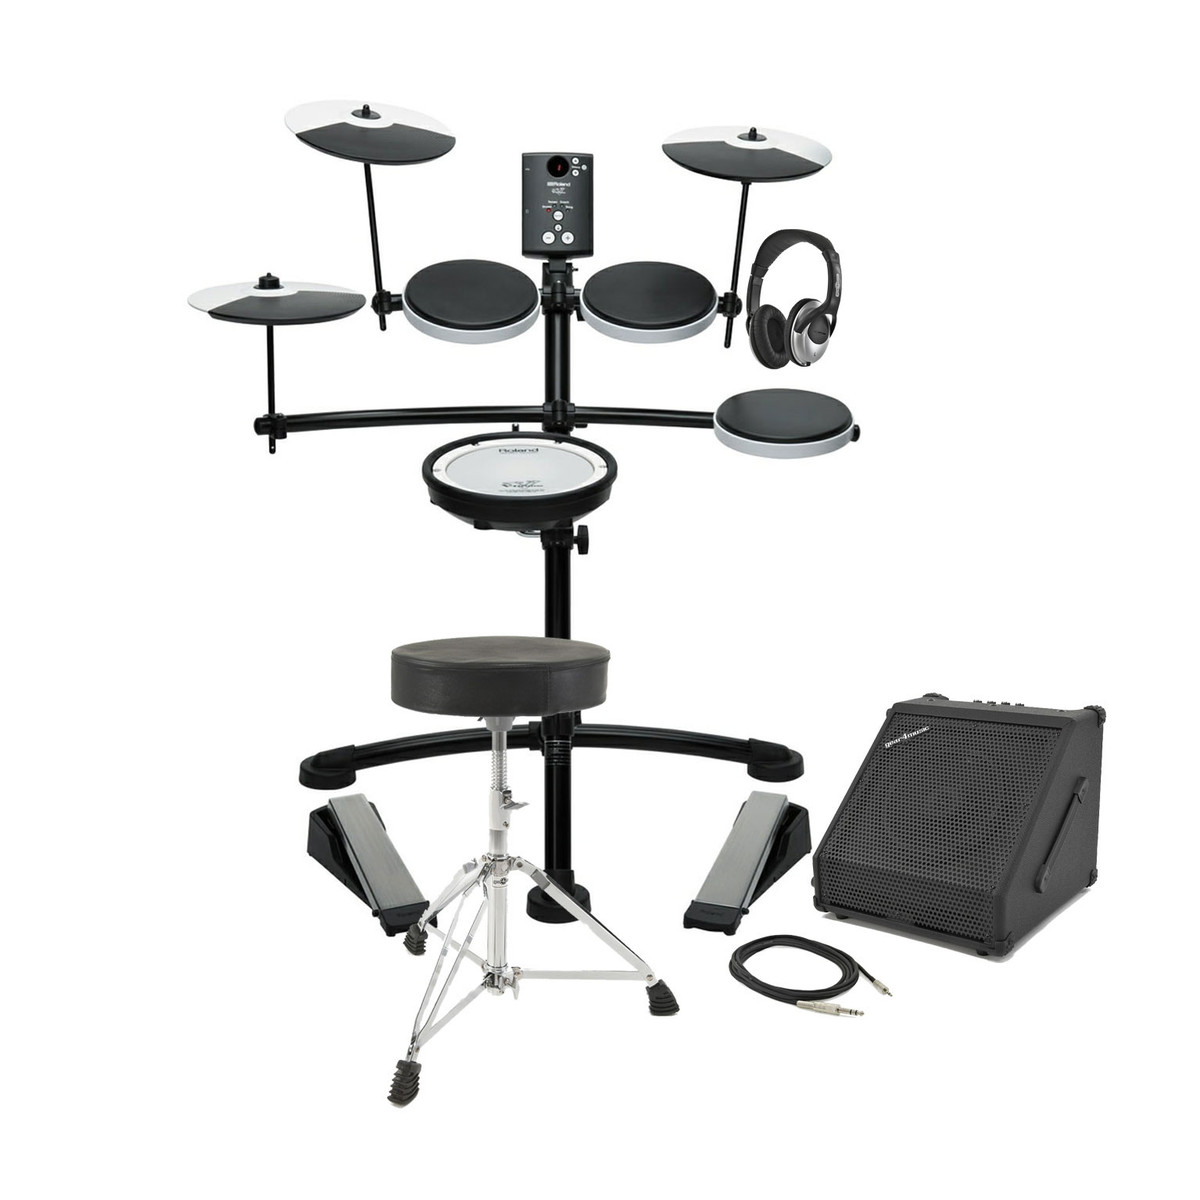 Roland Td 1kv V Drums Electronic Drum Kit With Amp Stool